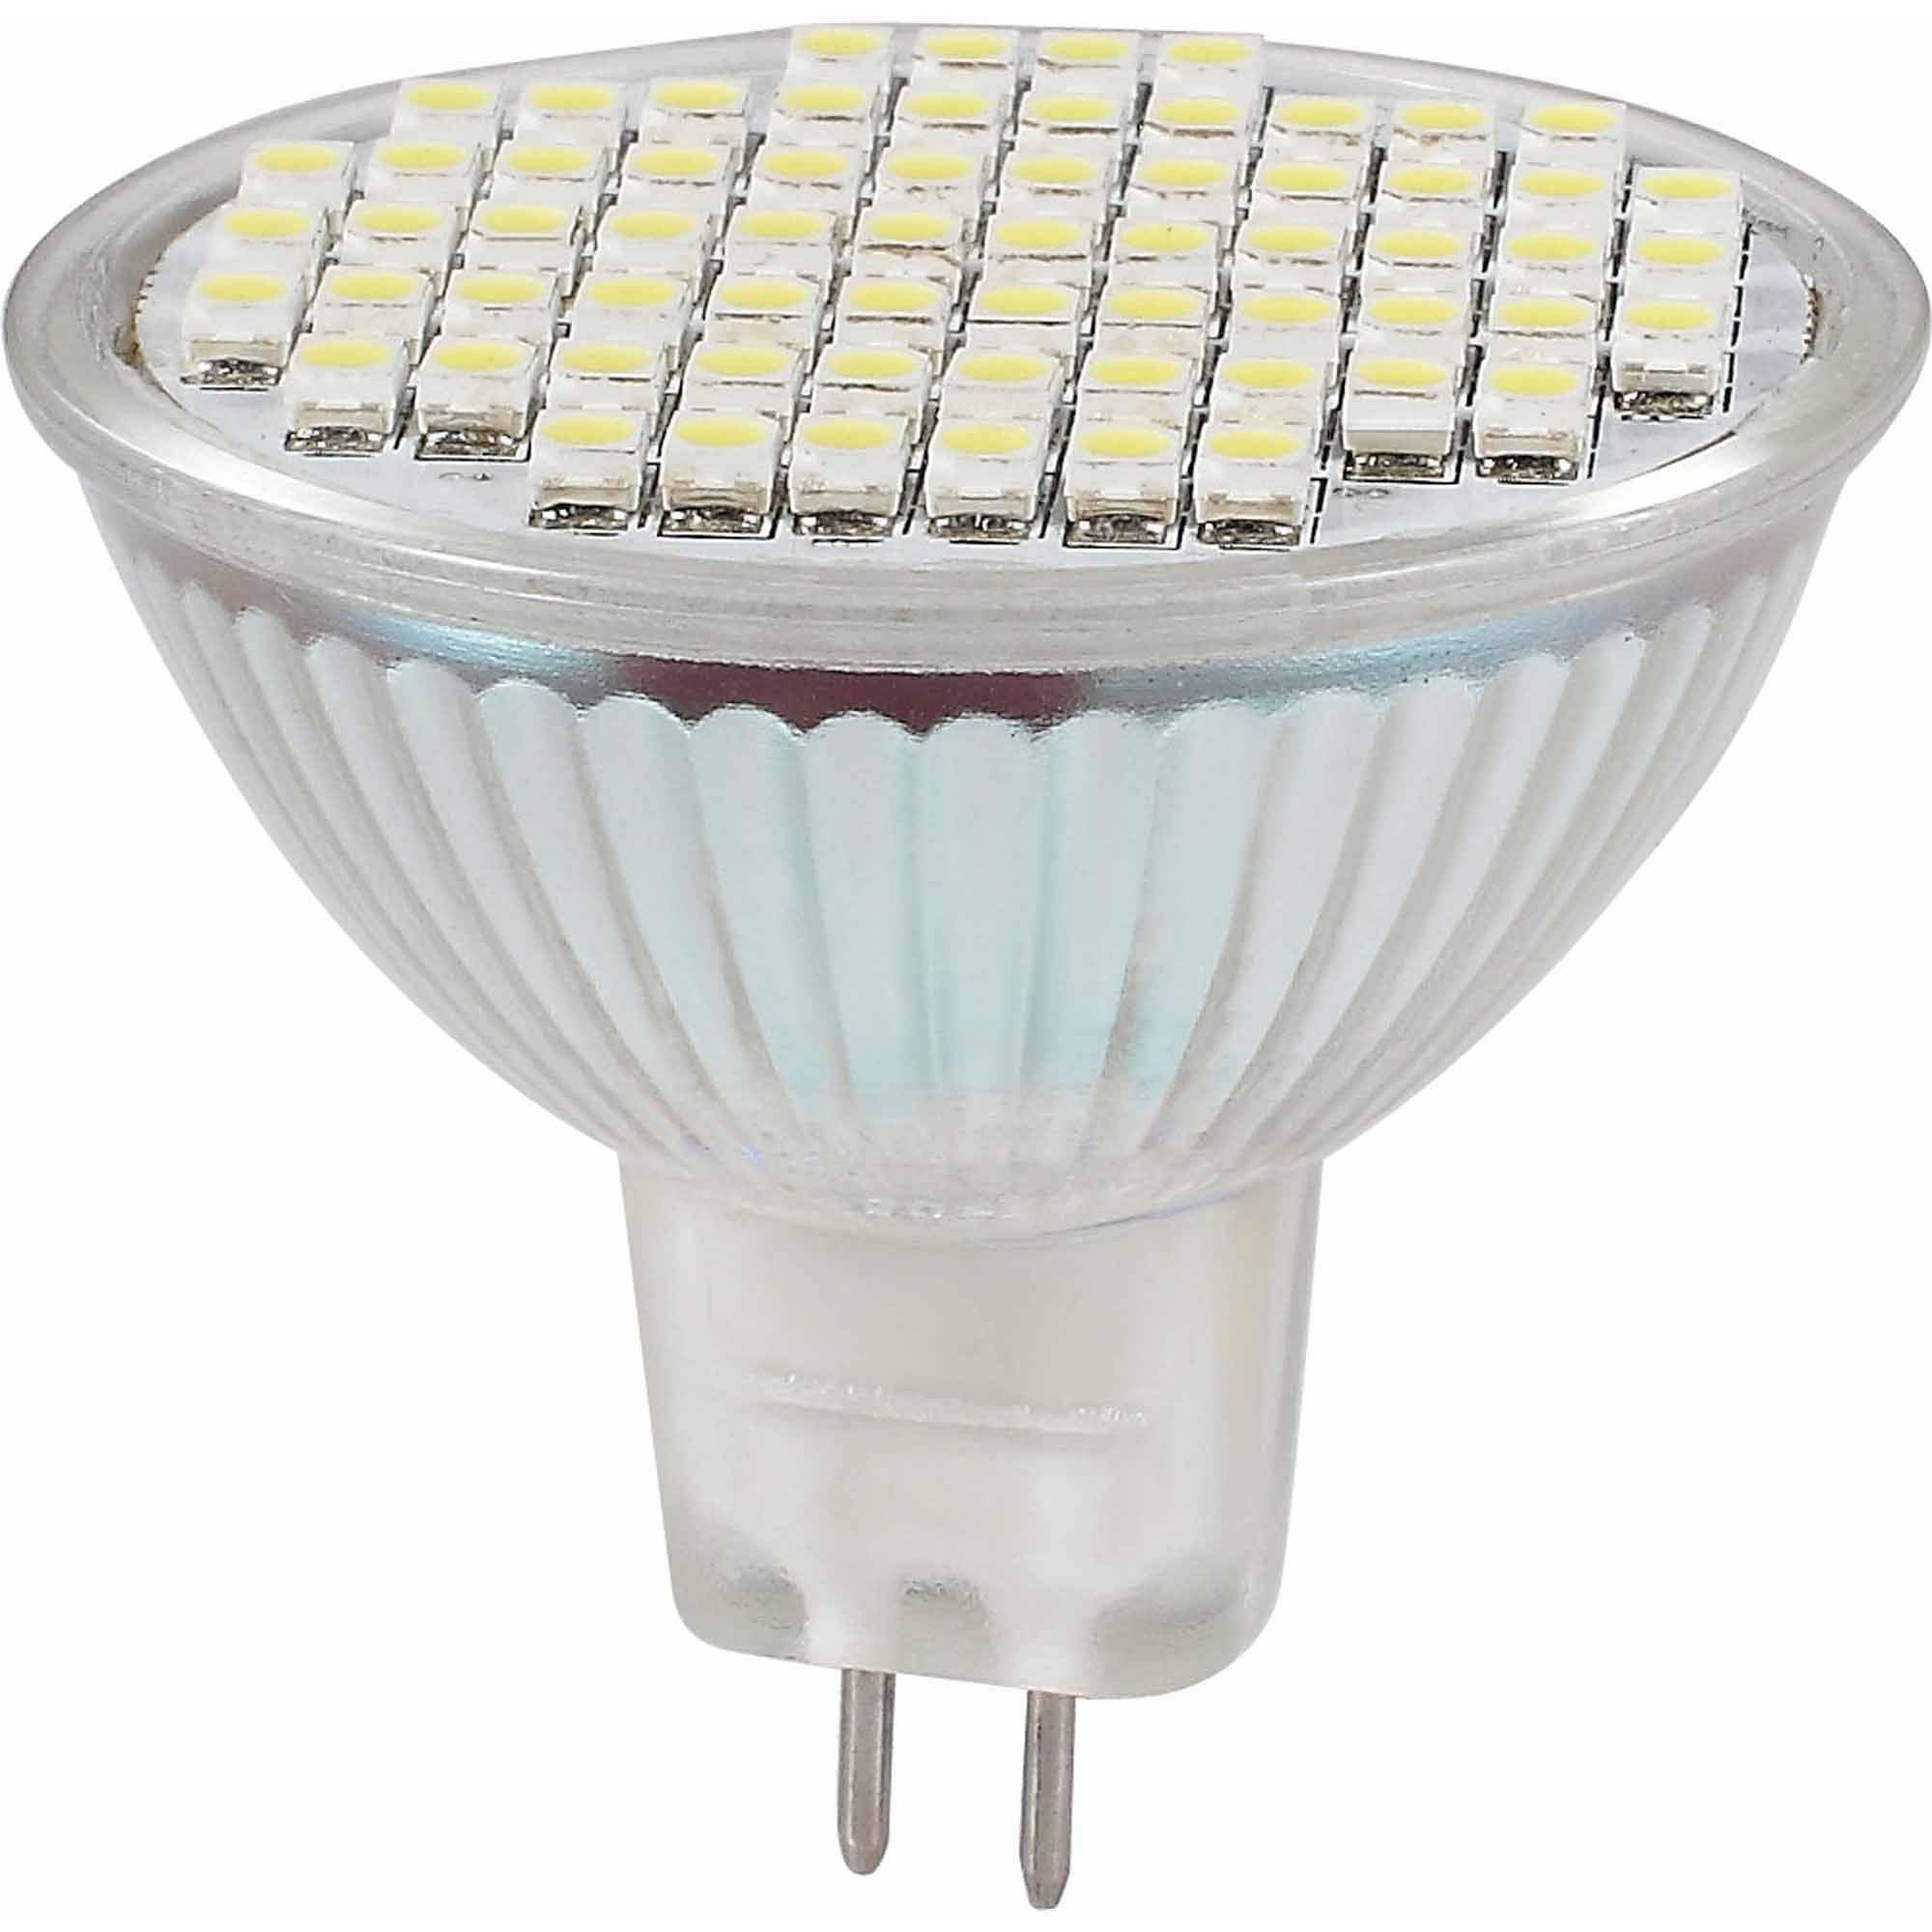 Green LongLife 3528104 MR16 Base 12V LED Bulb